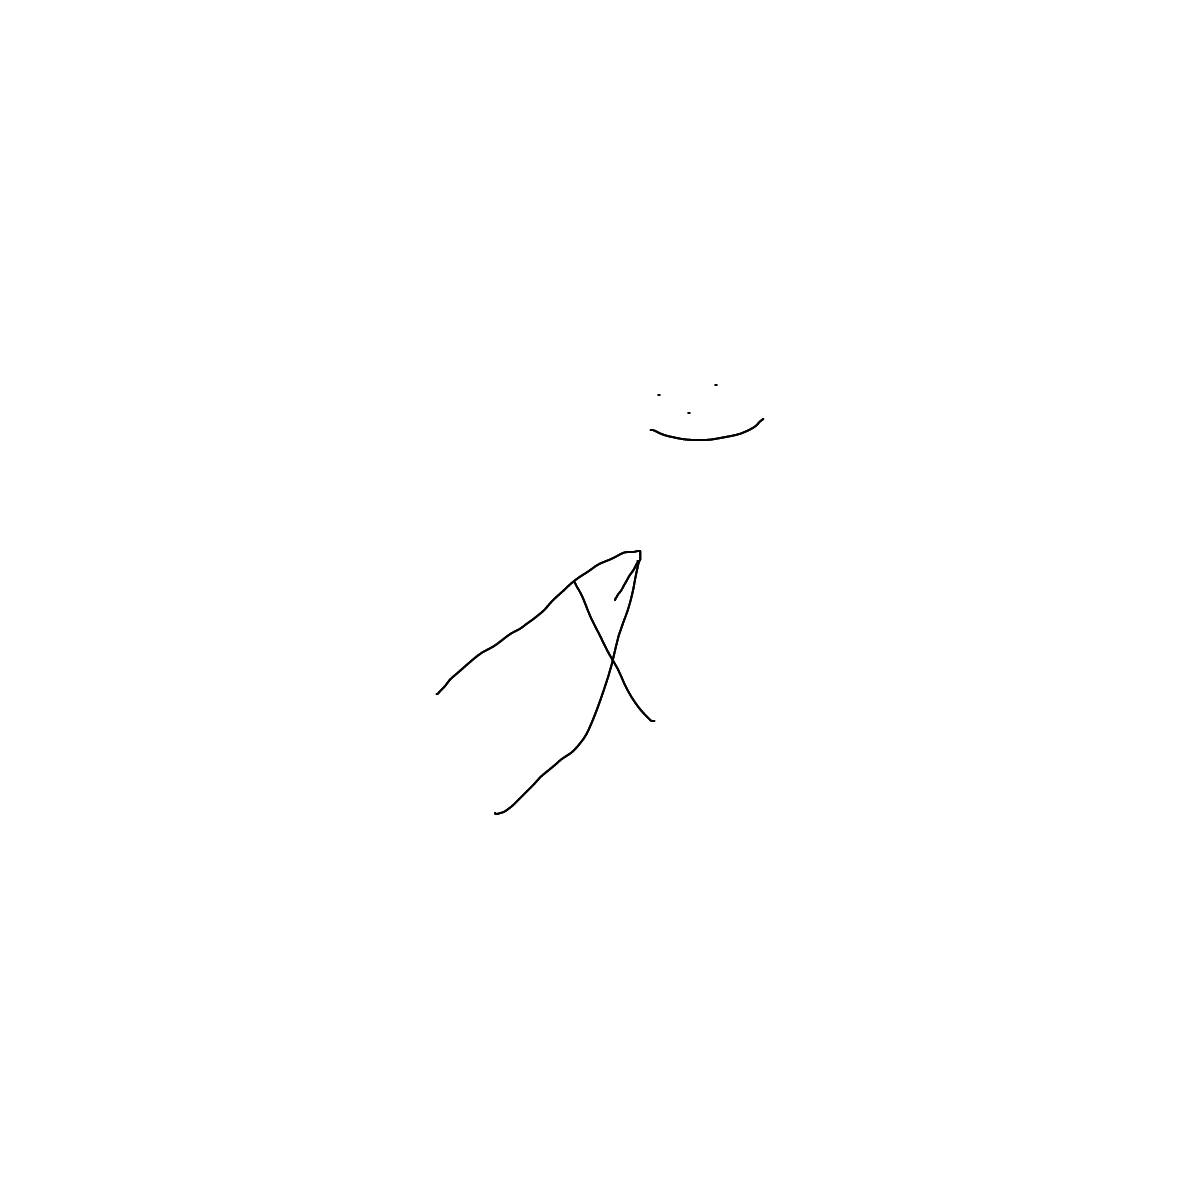 BAAAM drawing#2730 lat:29.7508754730224600lng: -94.9781417846679700